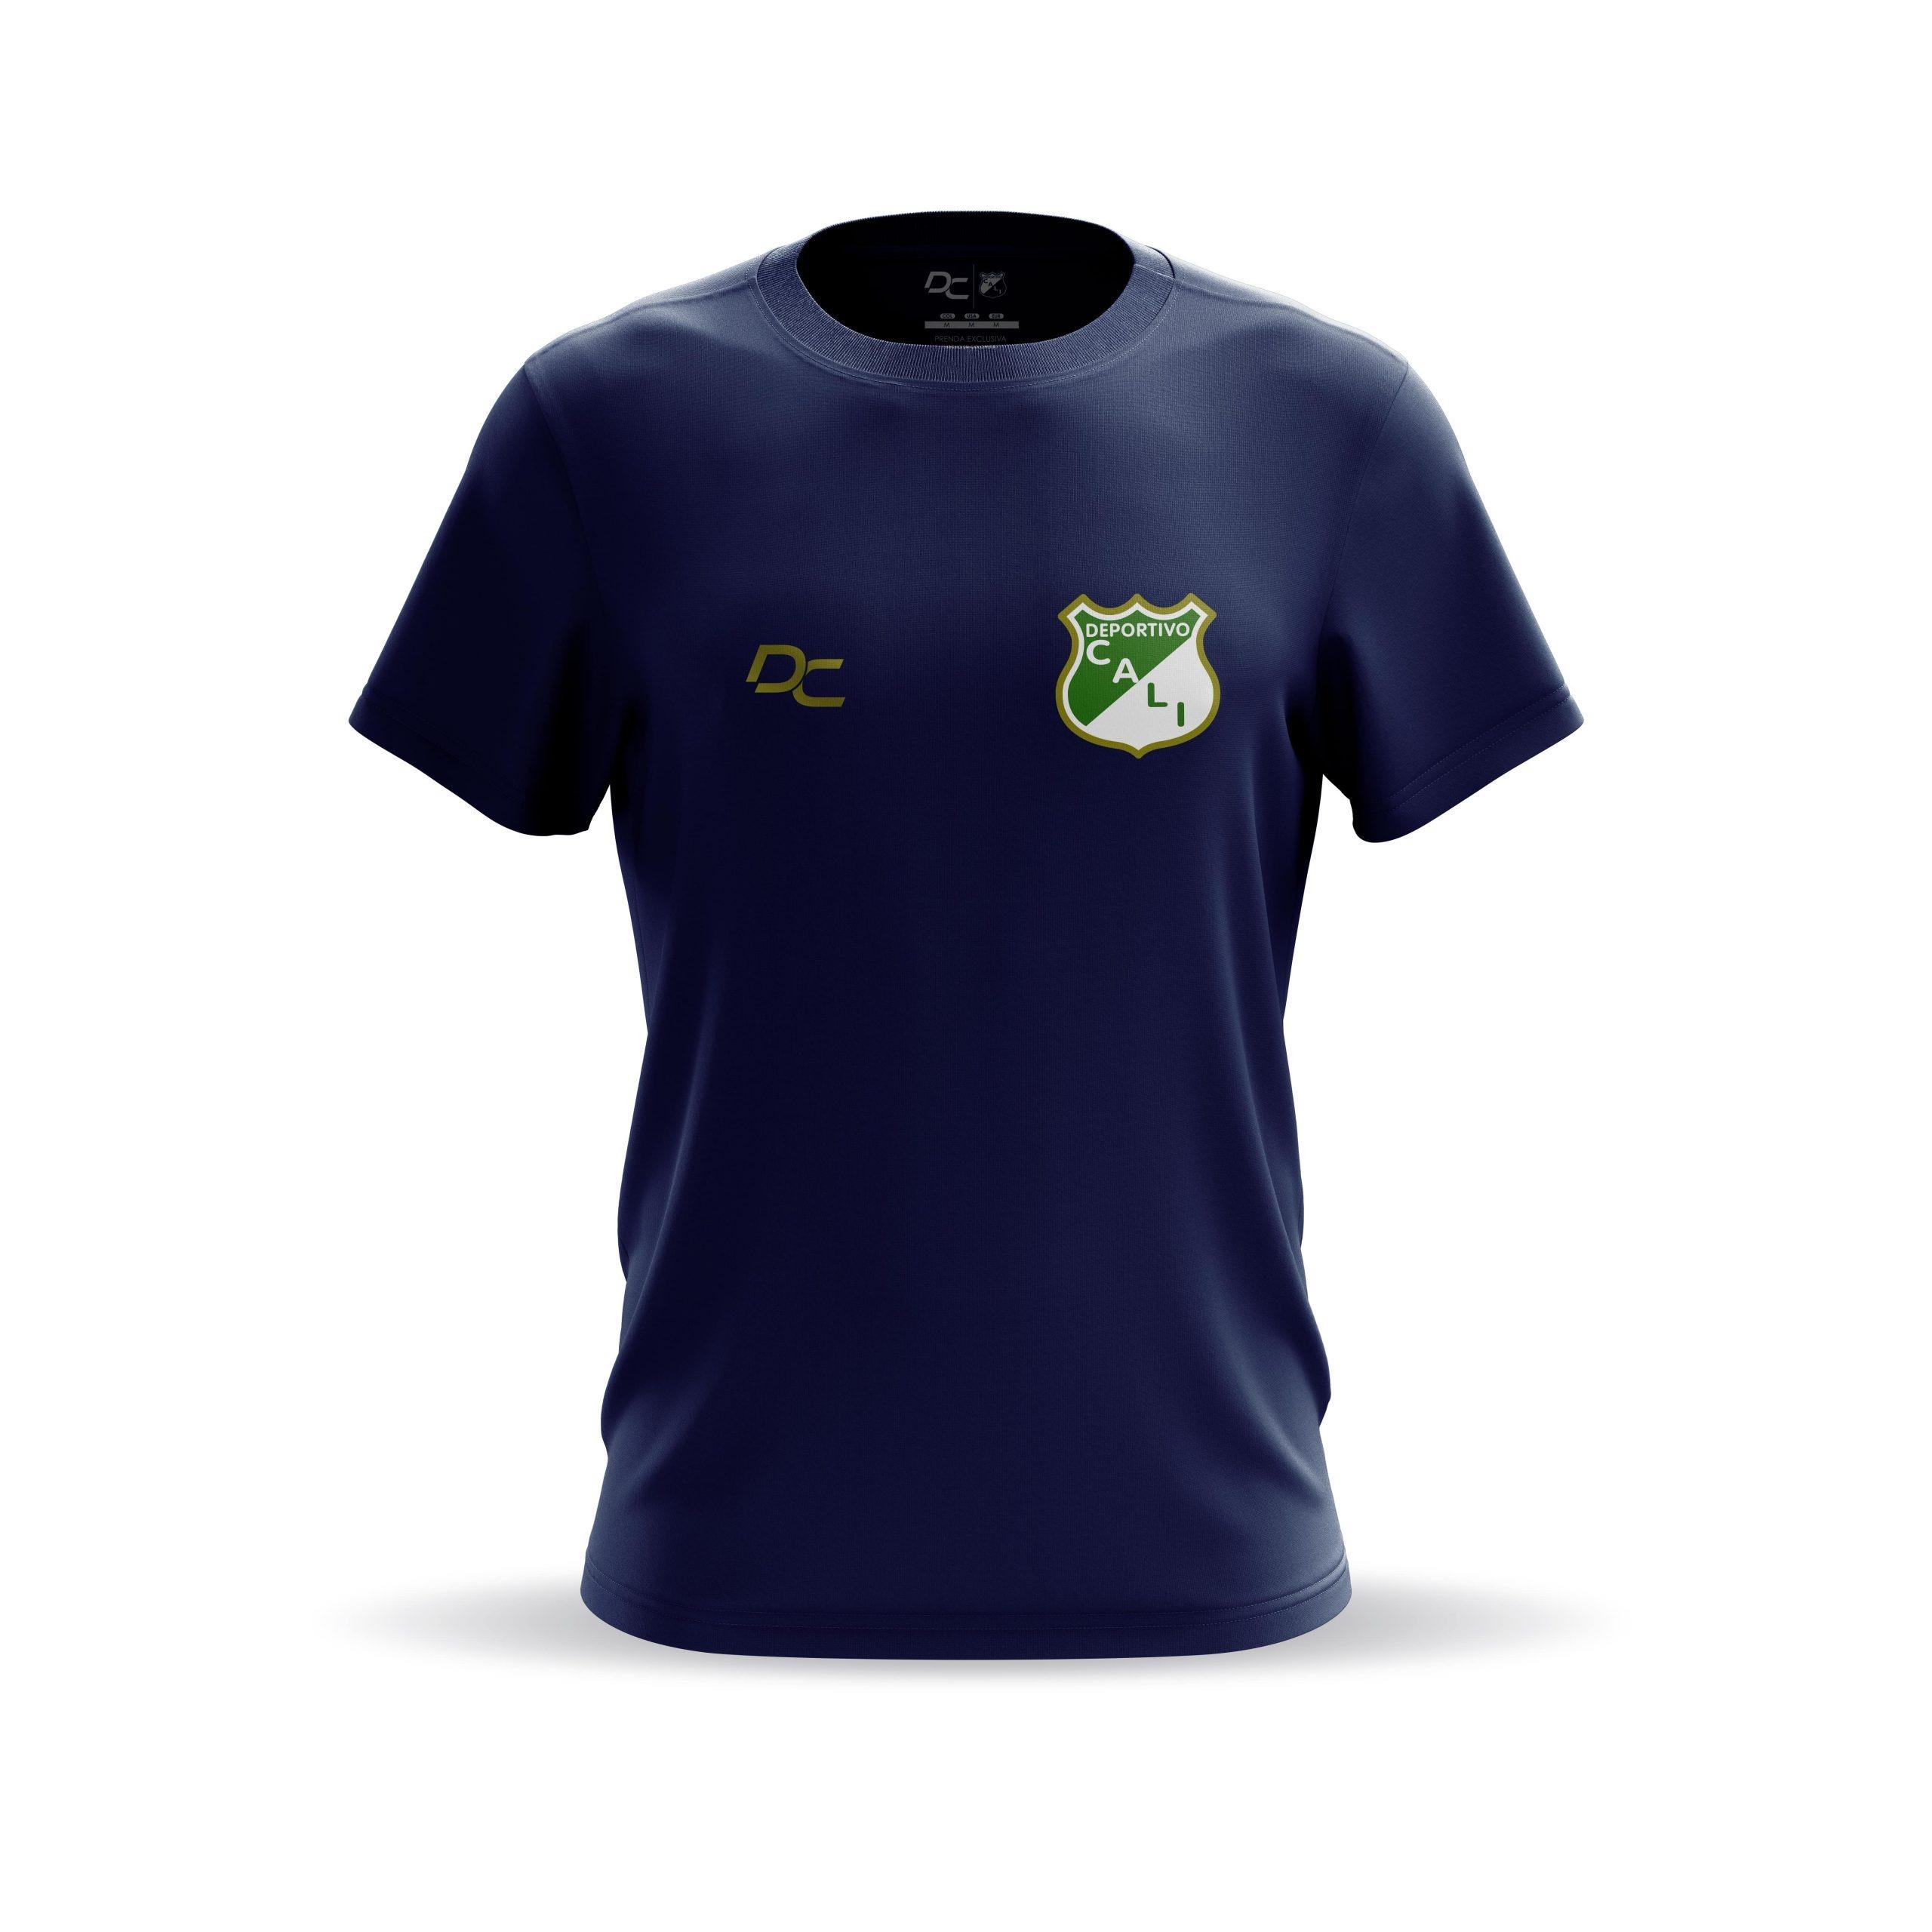 Faby Sport Camiseta Hombre Deportivo Cali Navy